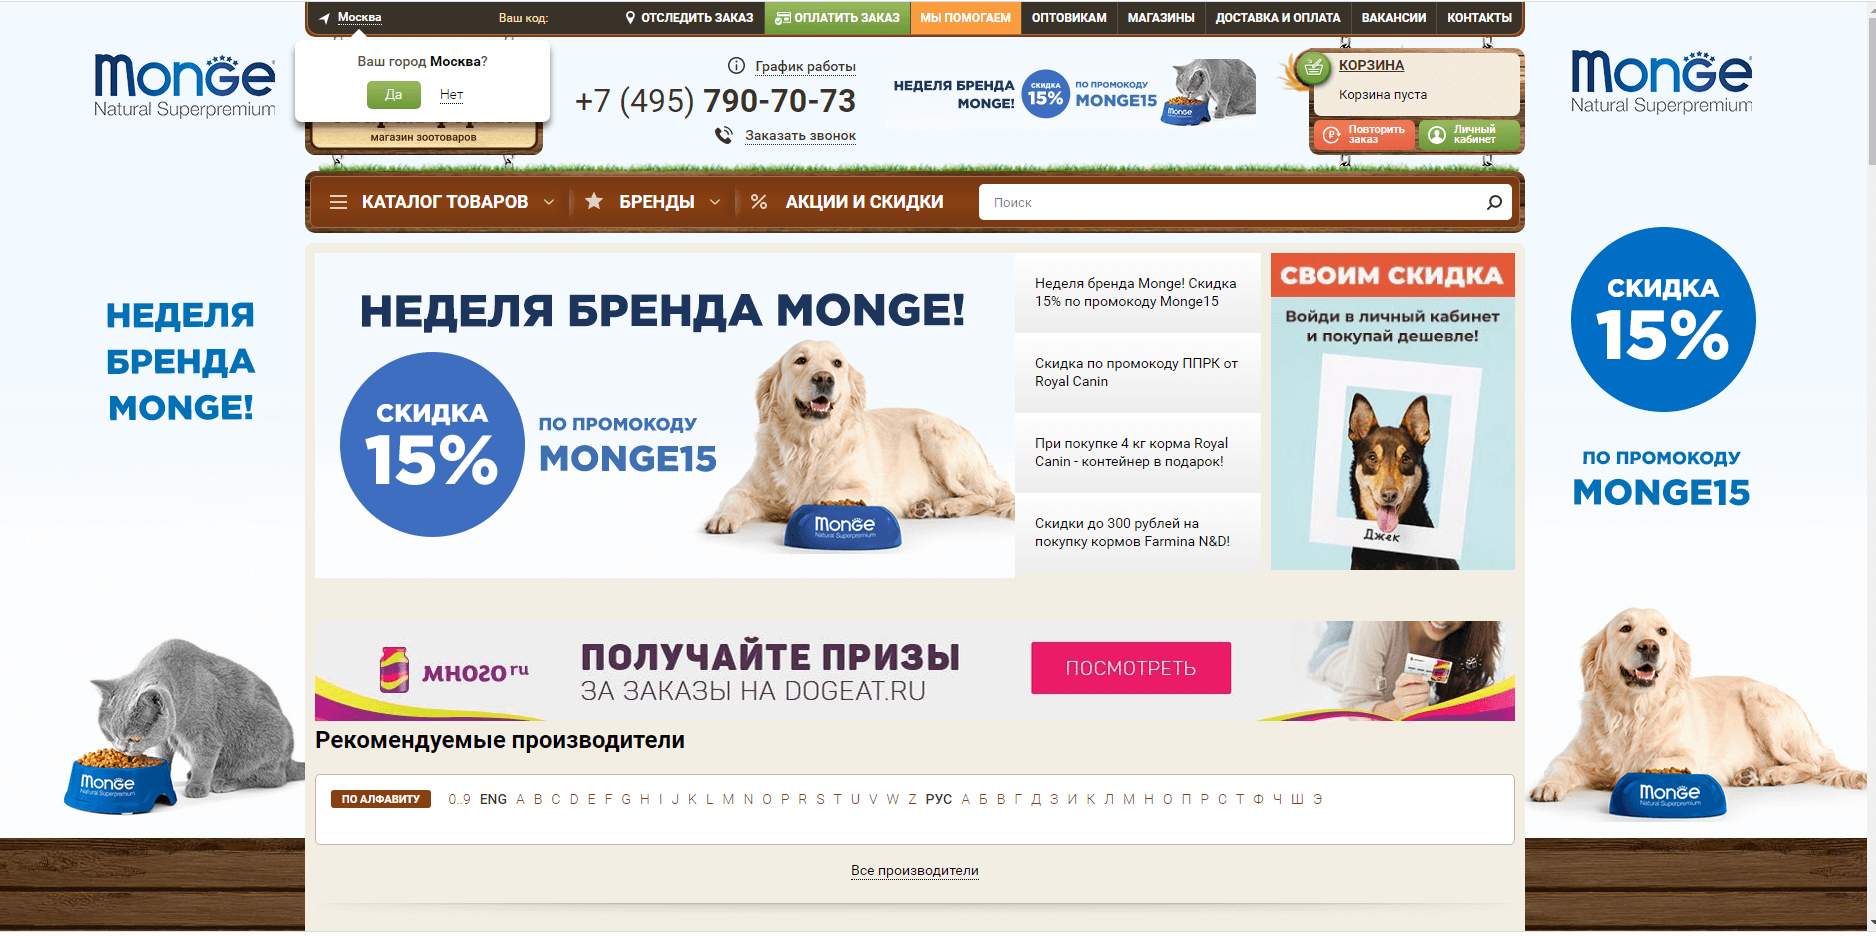 dogeat.ru website